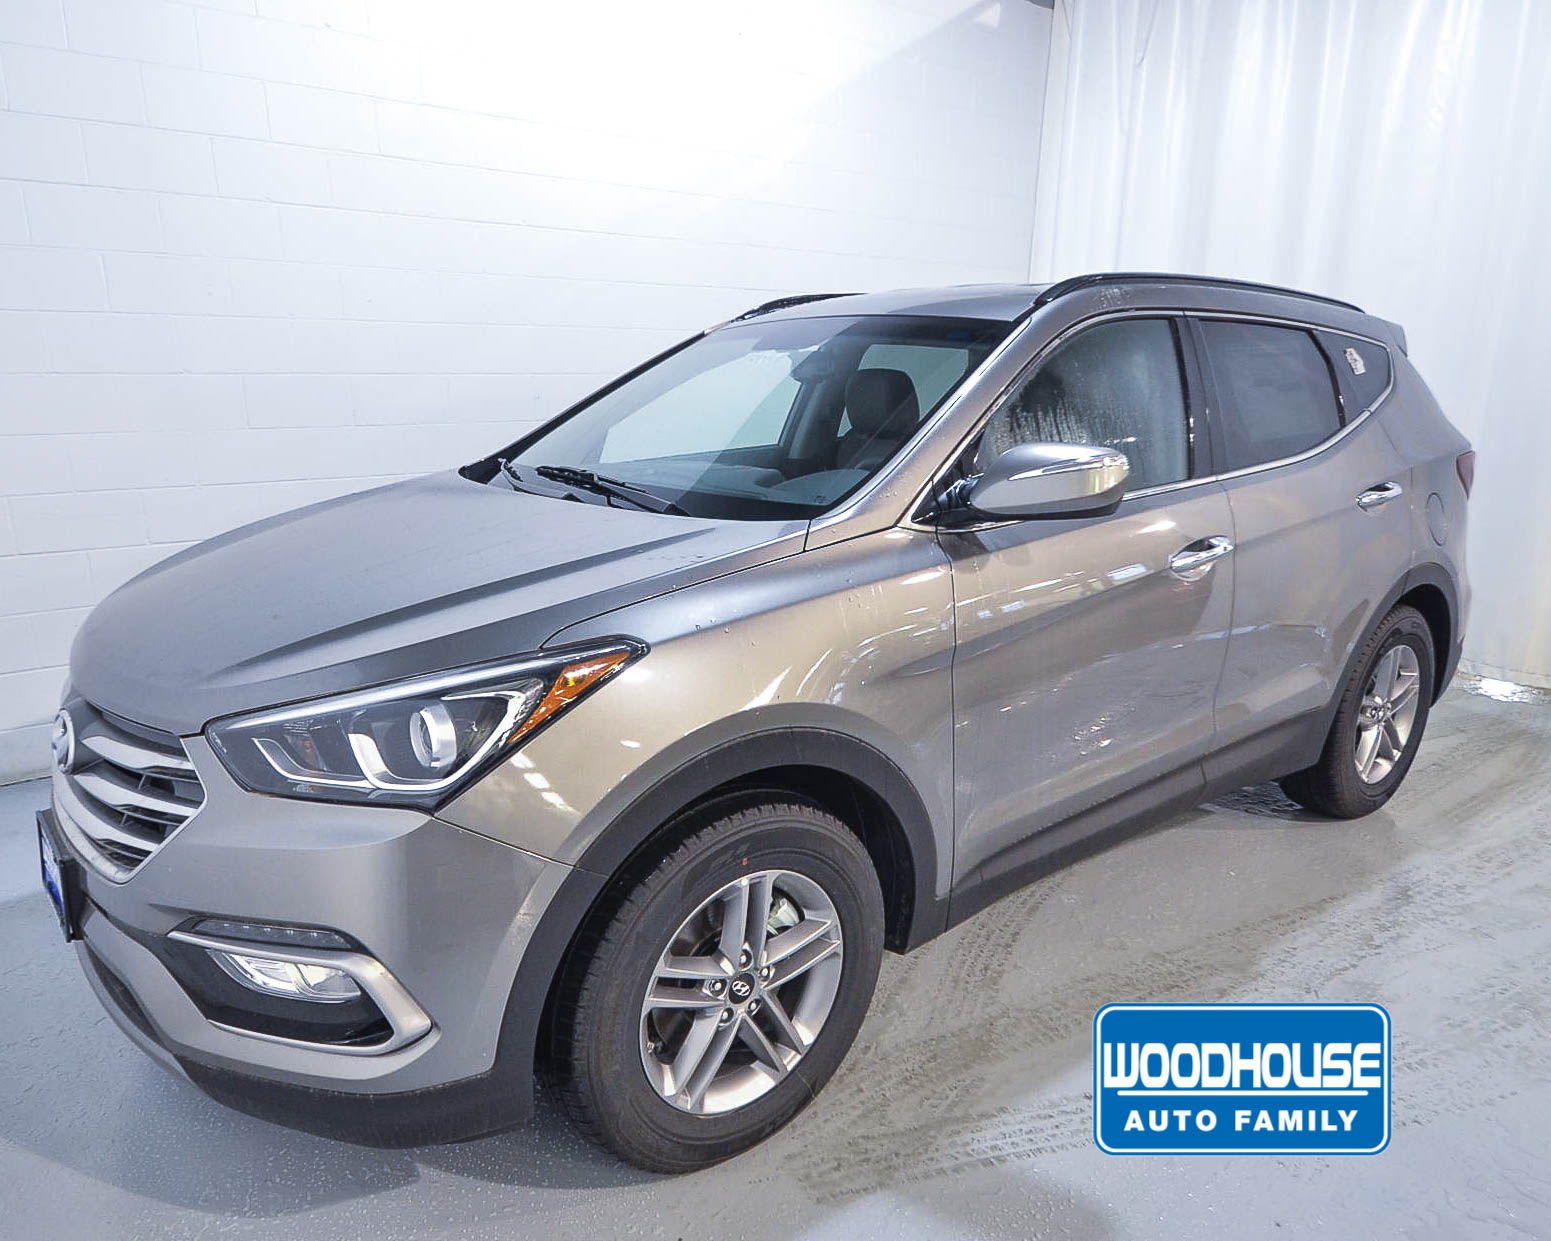 Hyundai Santa Fe For Sale Woodhouse Auto